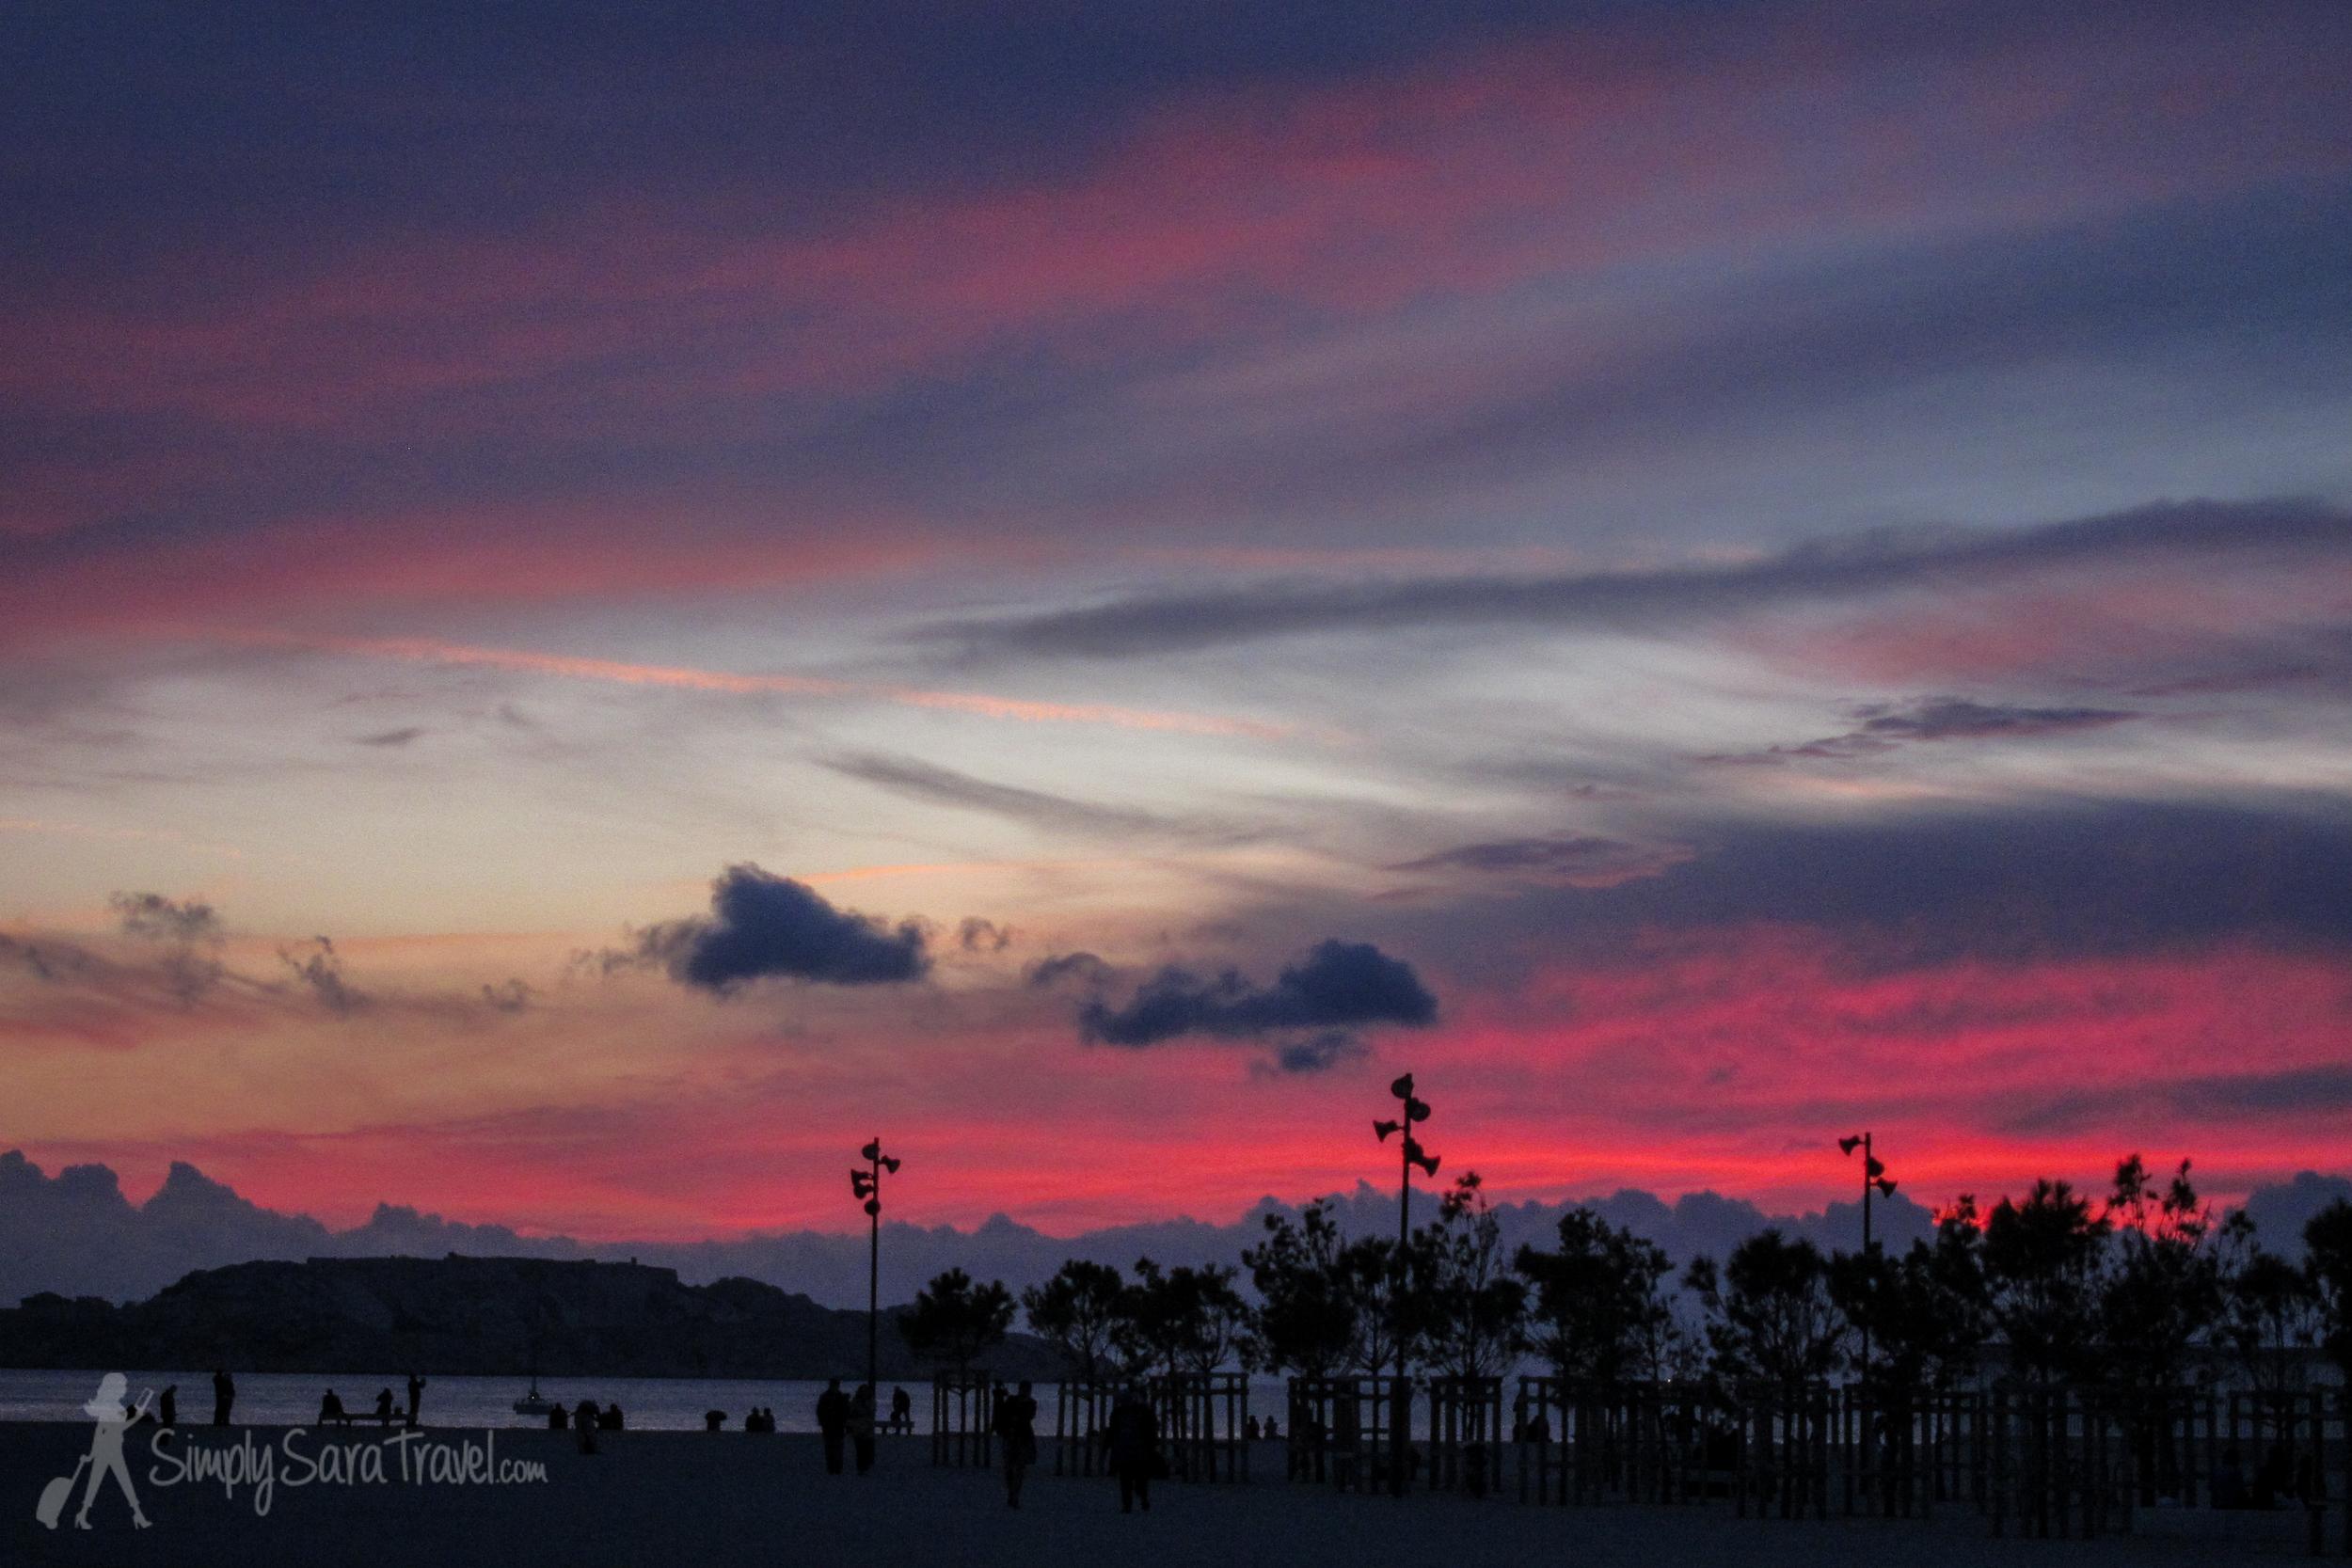 Sunset over theMediterranean in Marseille at itsVieux Port (October 2013)